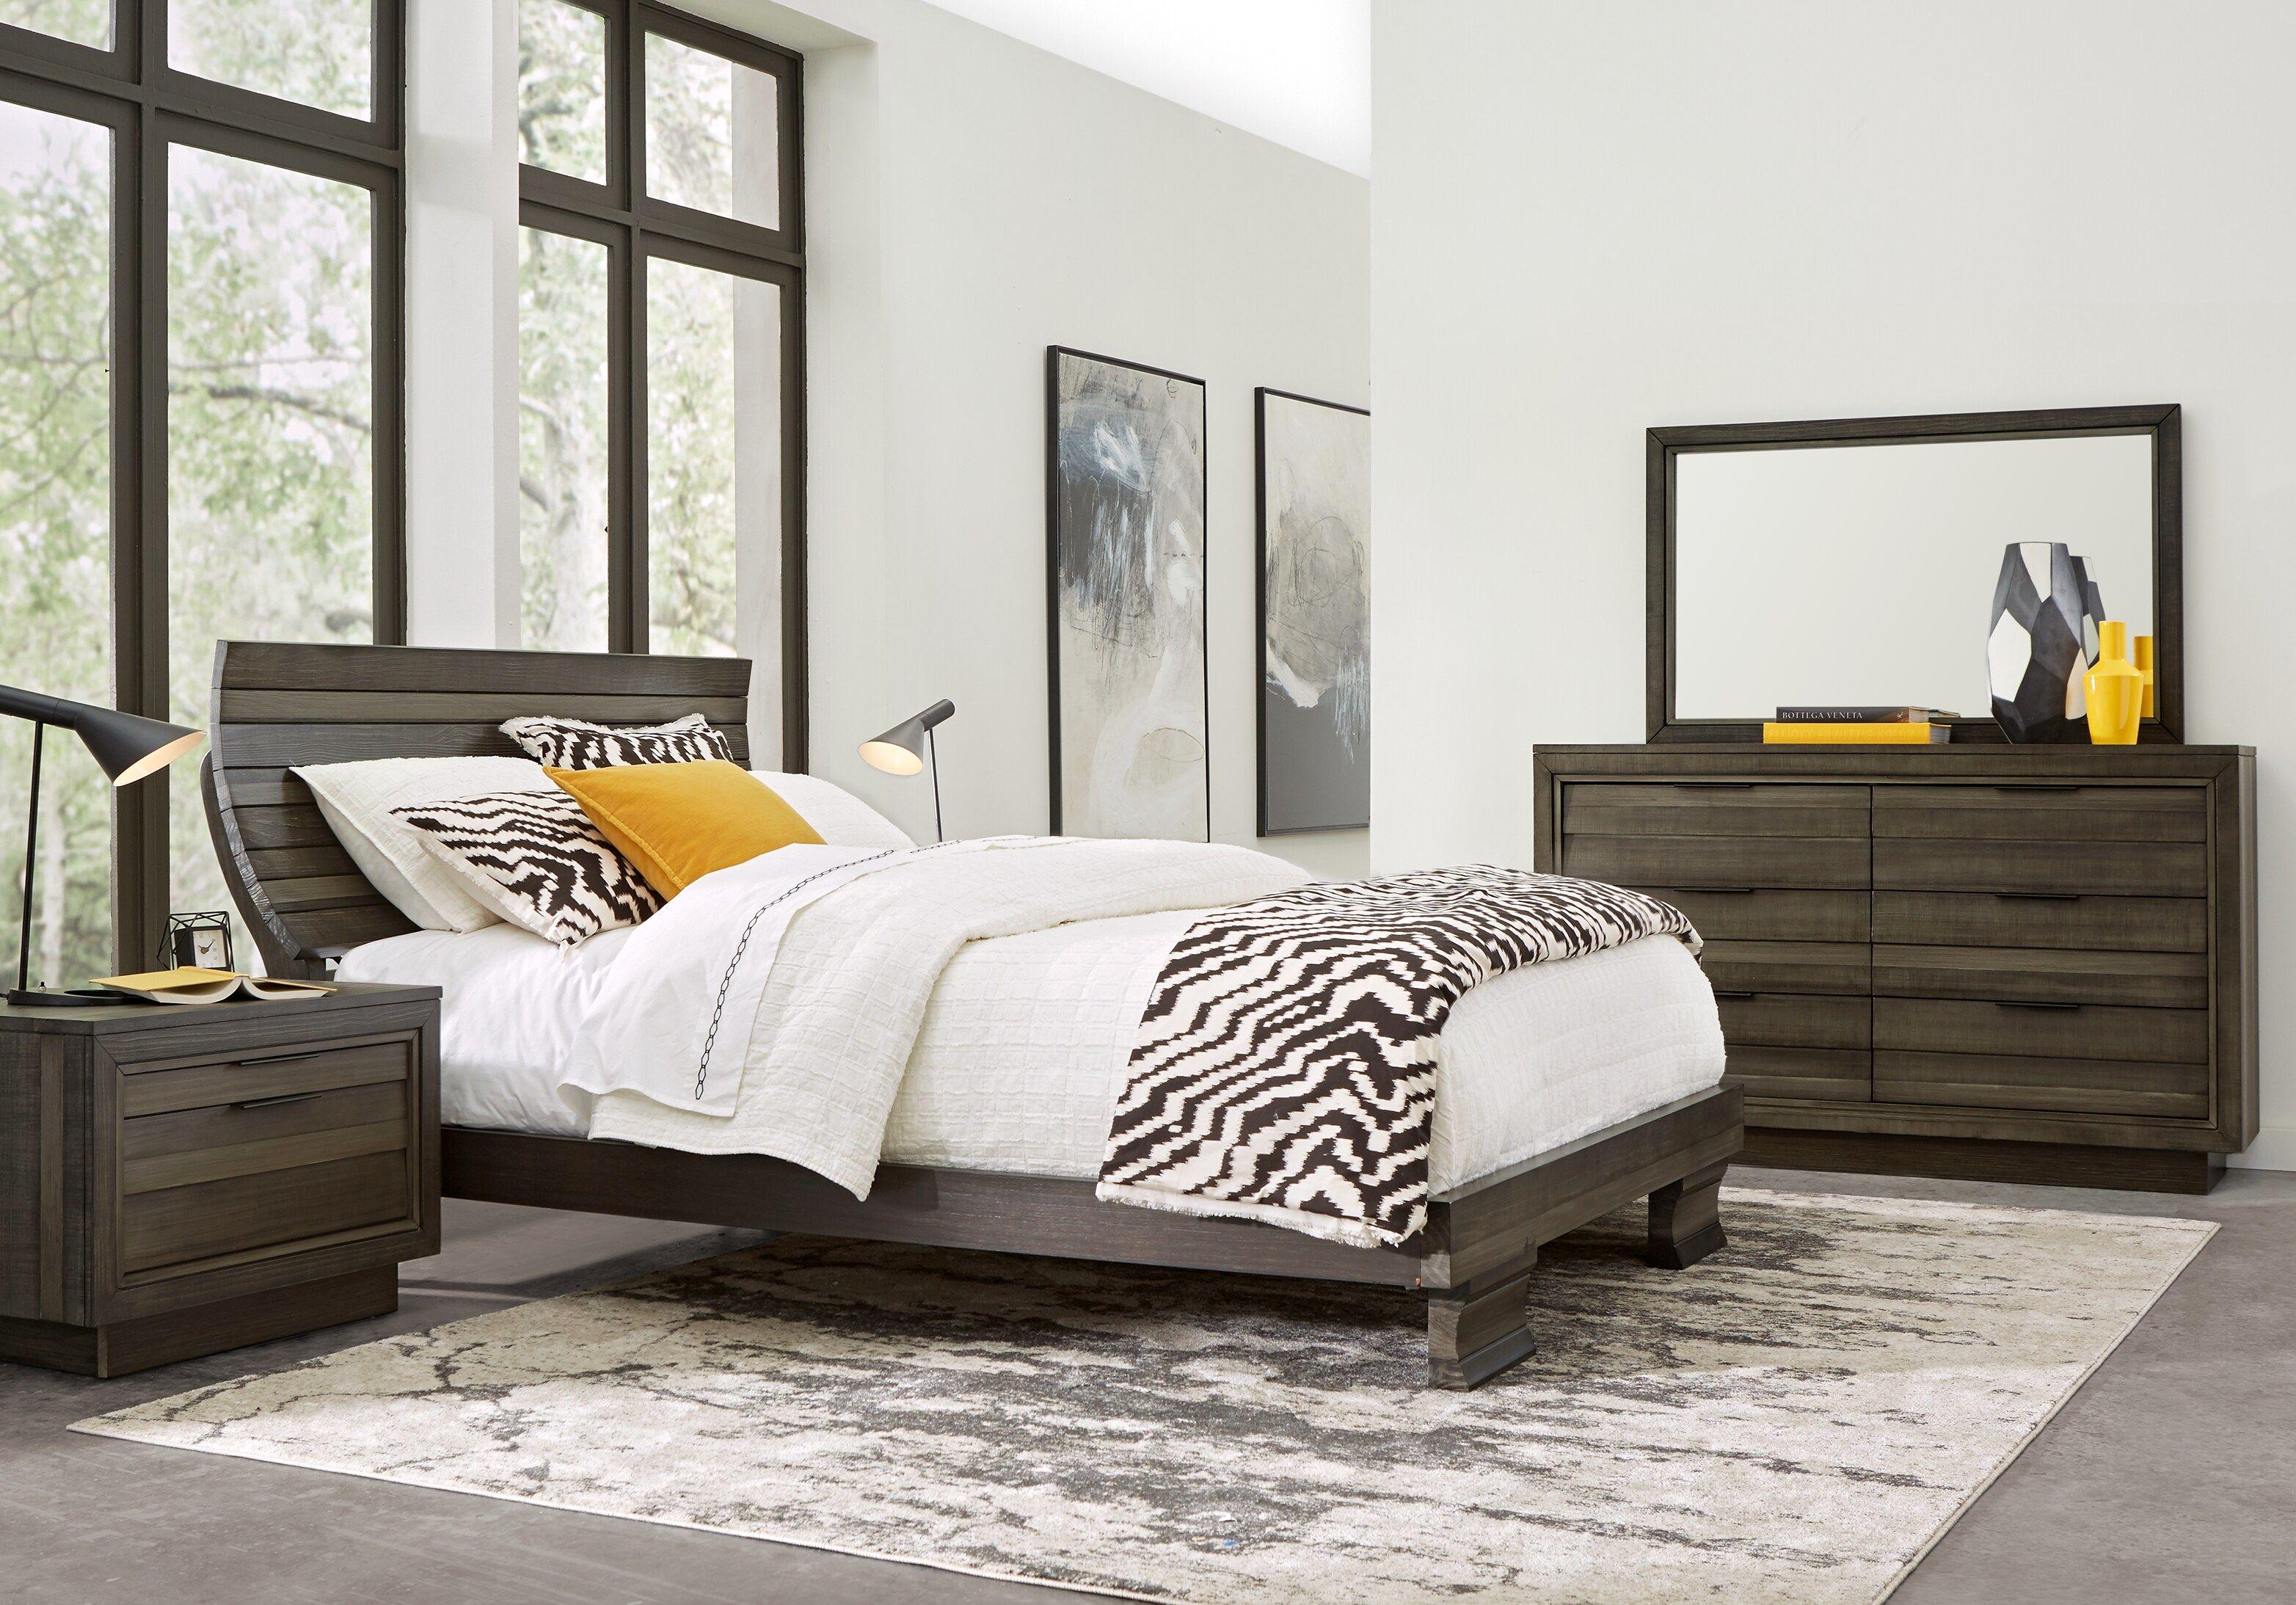 River Street Graphite 5 Pc Queen Scoop Bedroom King Size Bedroom Furniture Sets Bedroom Sets Queen Bedroom Furniture Sets